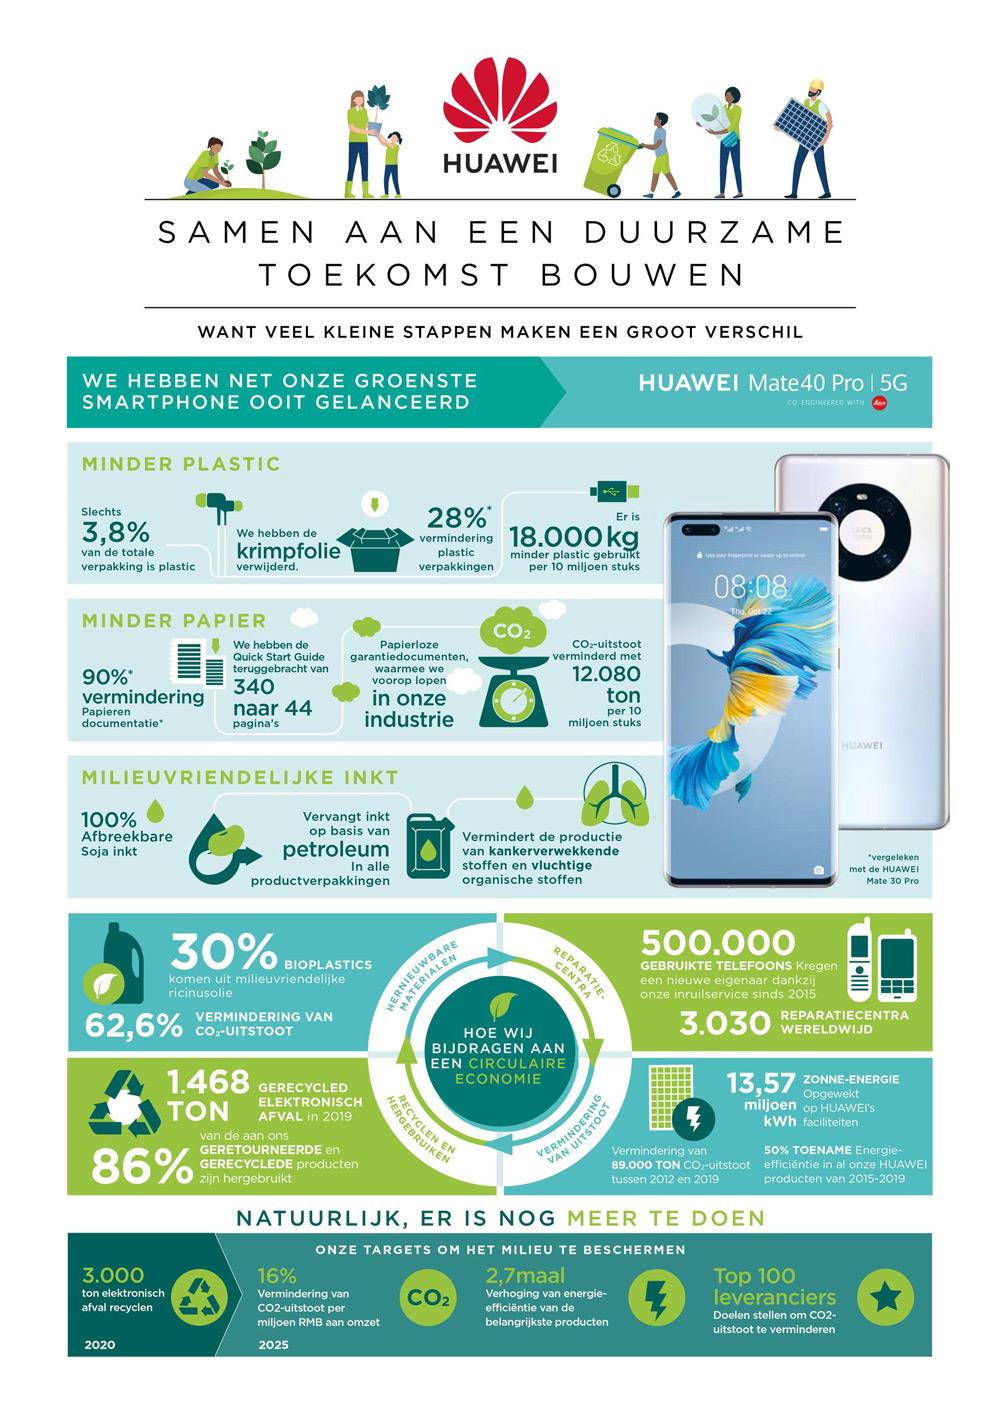 Huawei duurzaamheid Mate 40 Pro